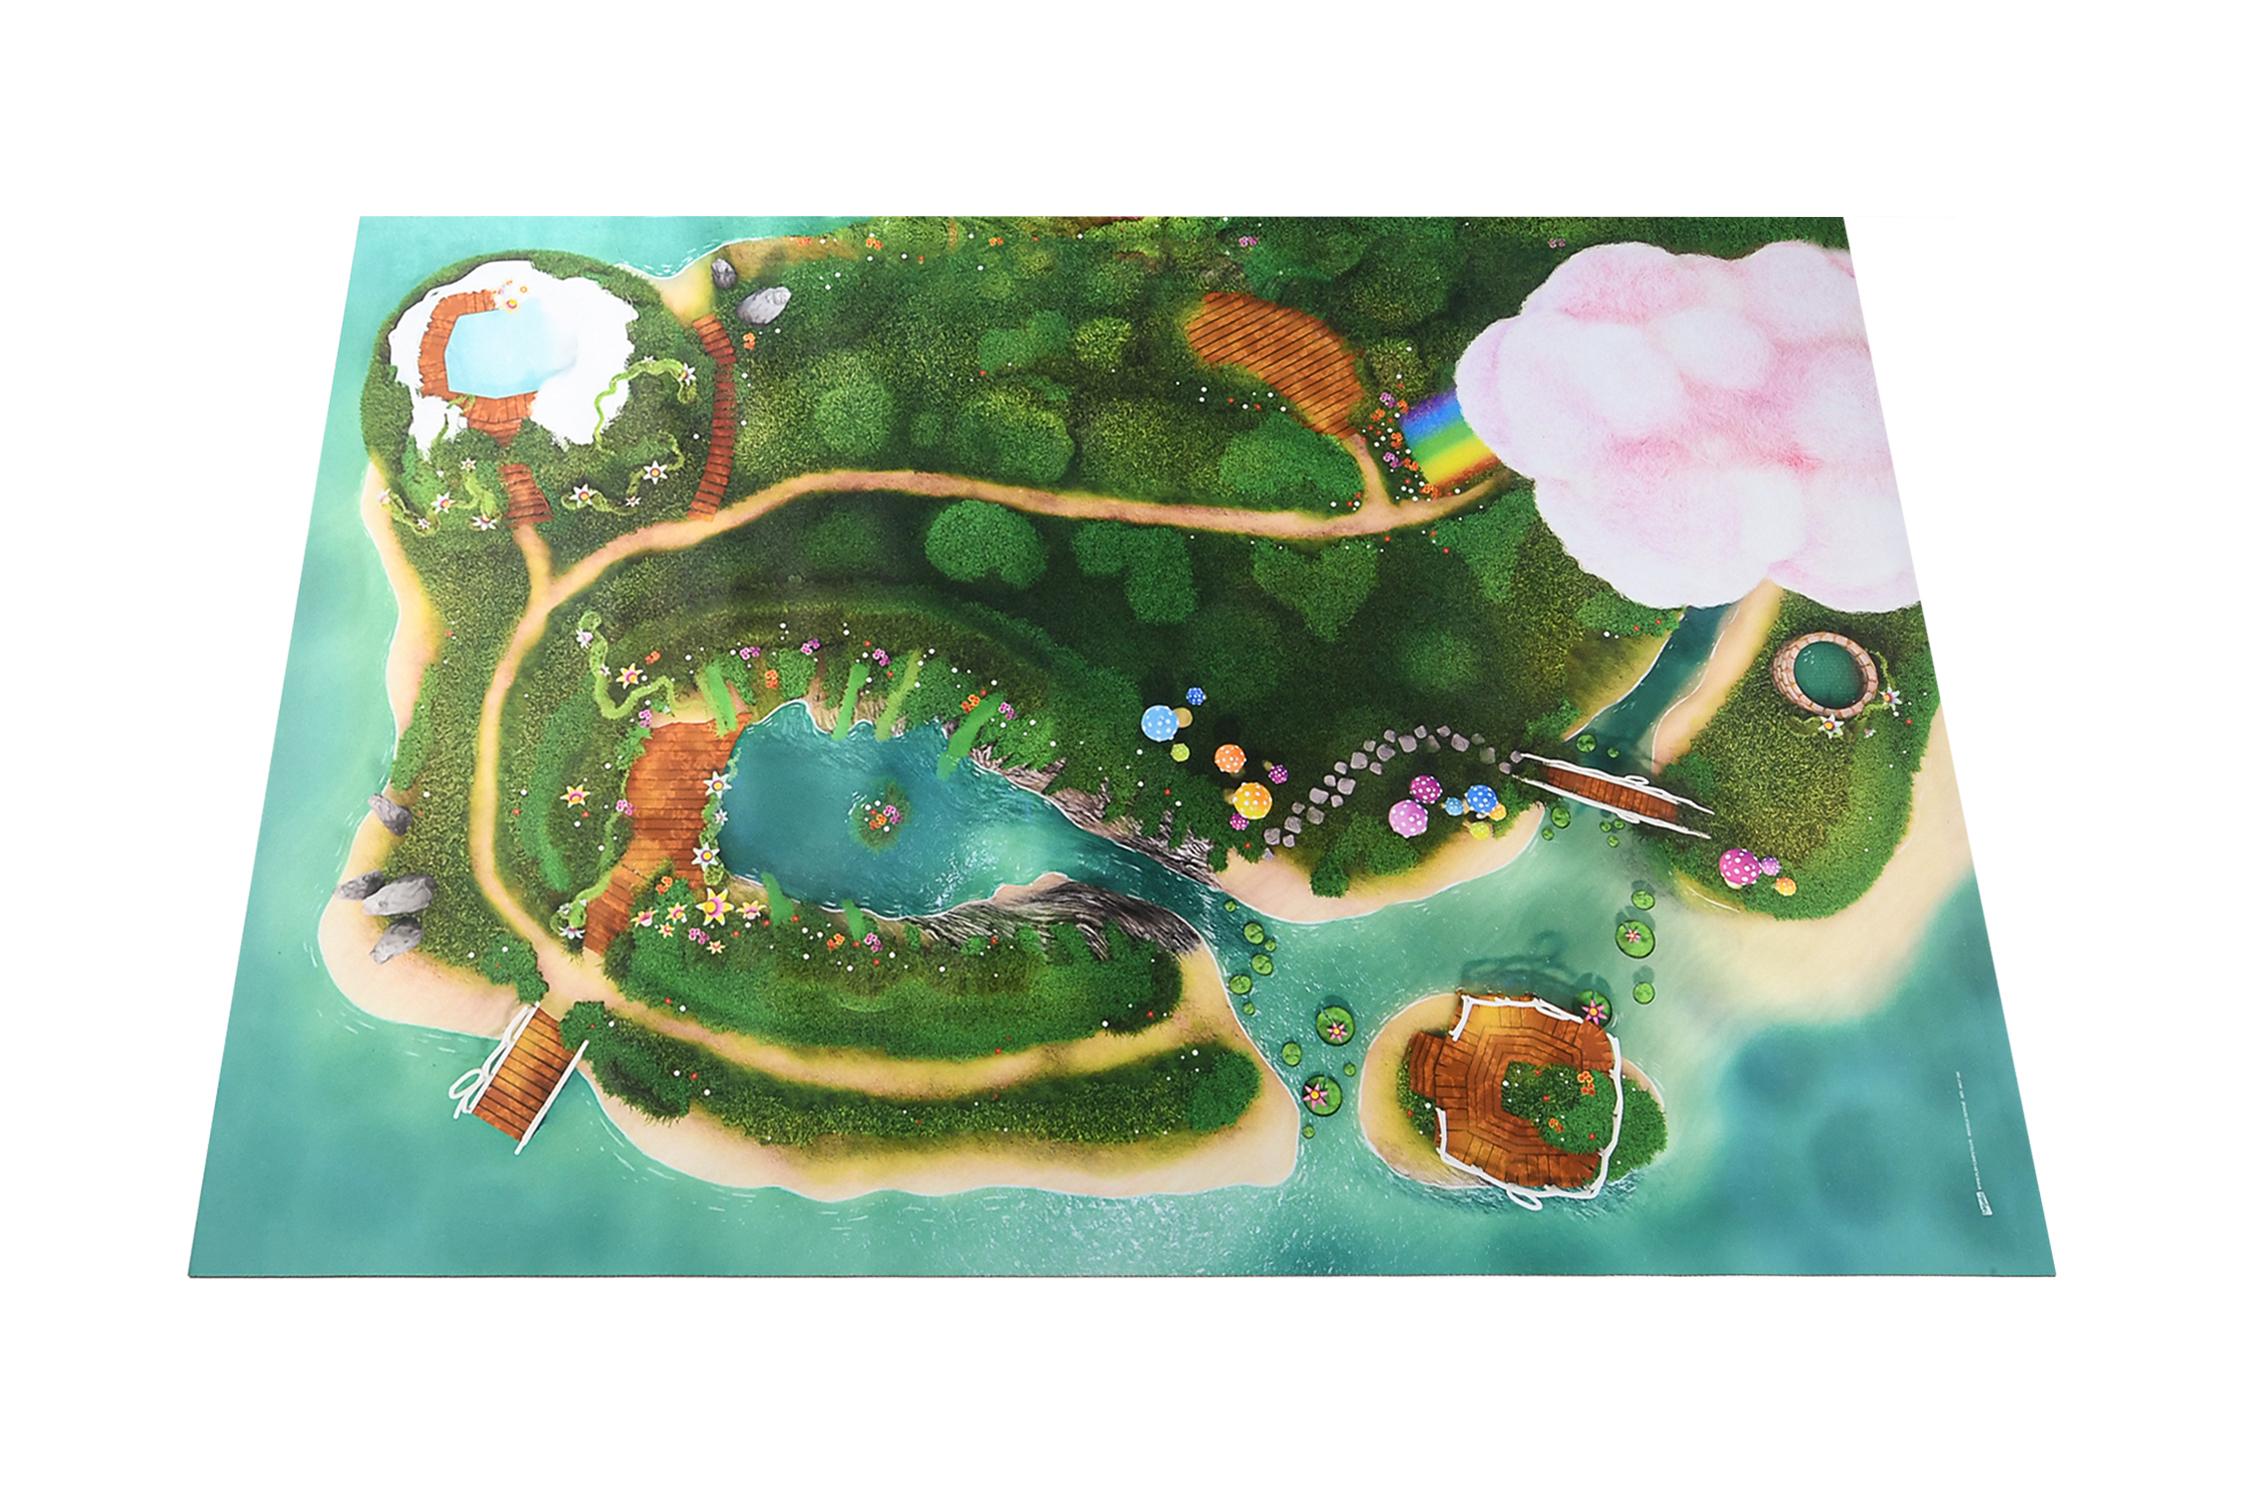 Groot Speelkleed Carpeto - Sprookjes Lagune 120 x 180cm